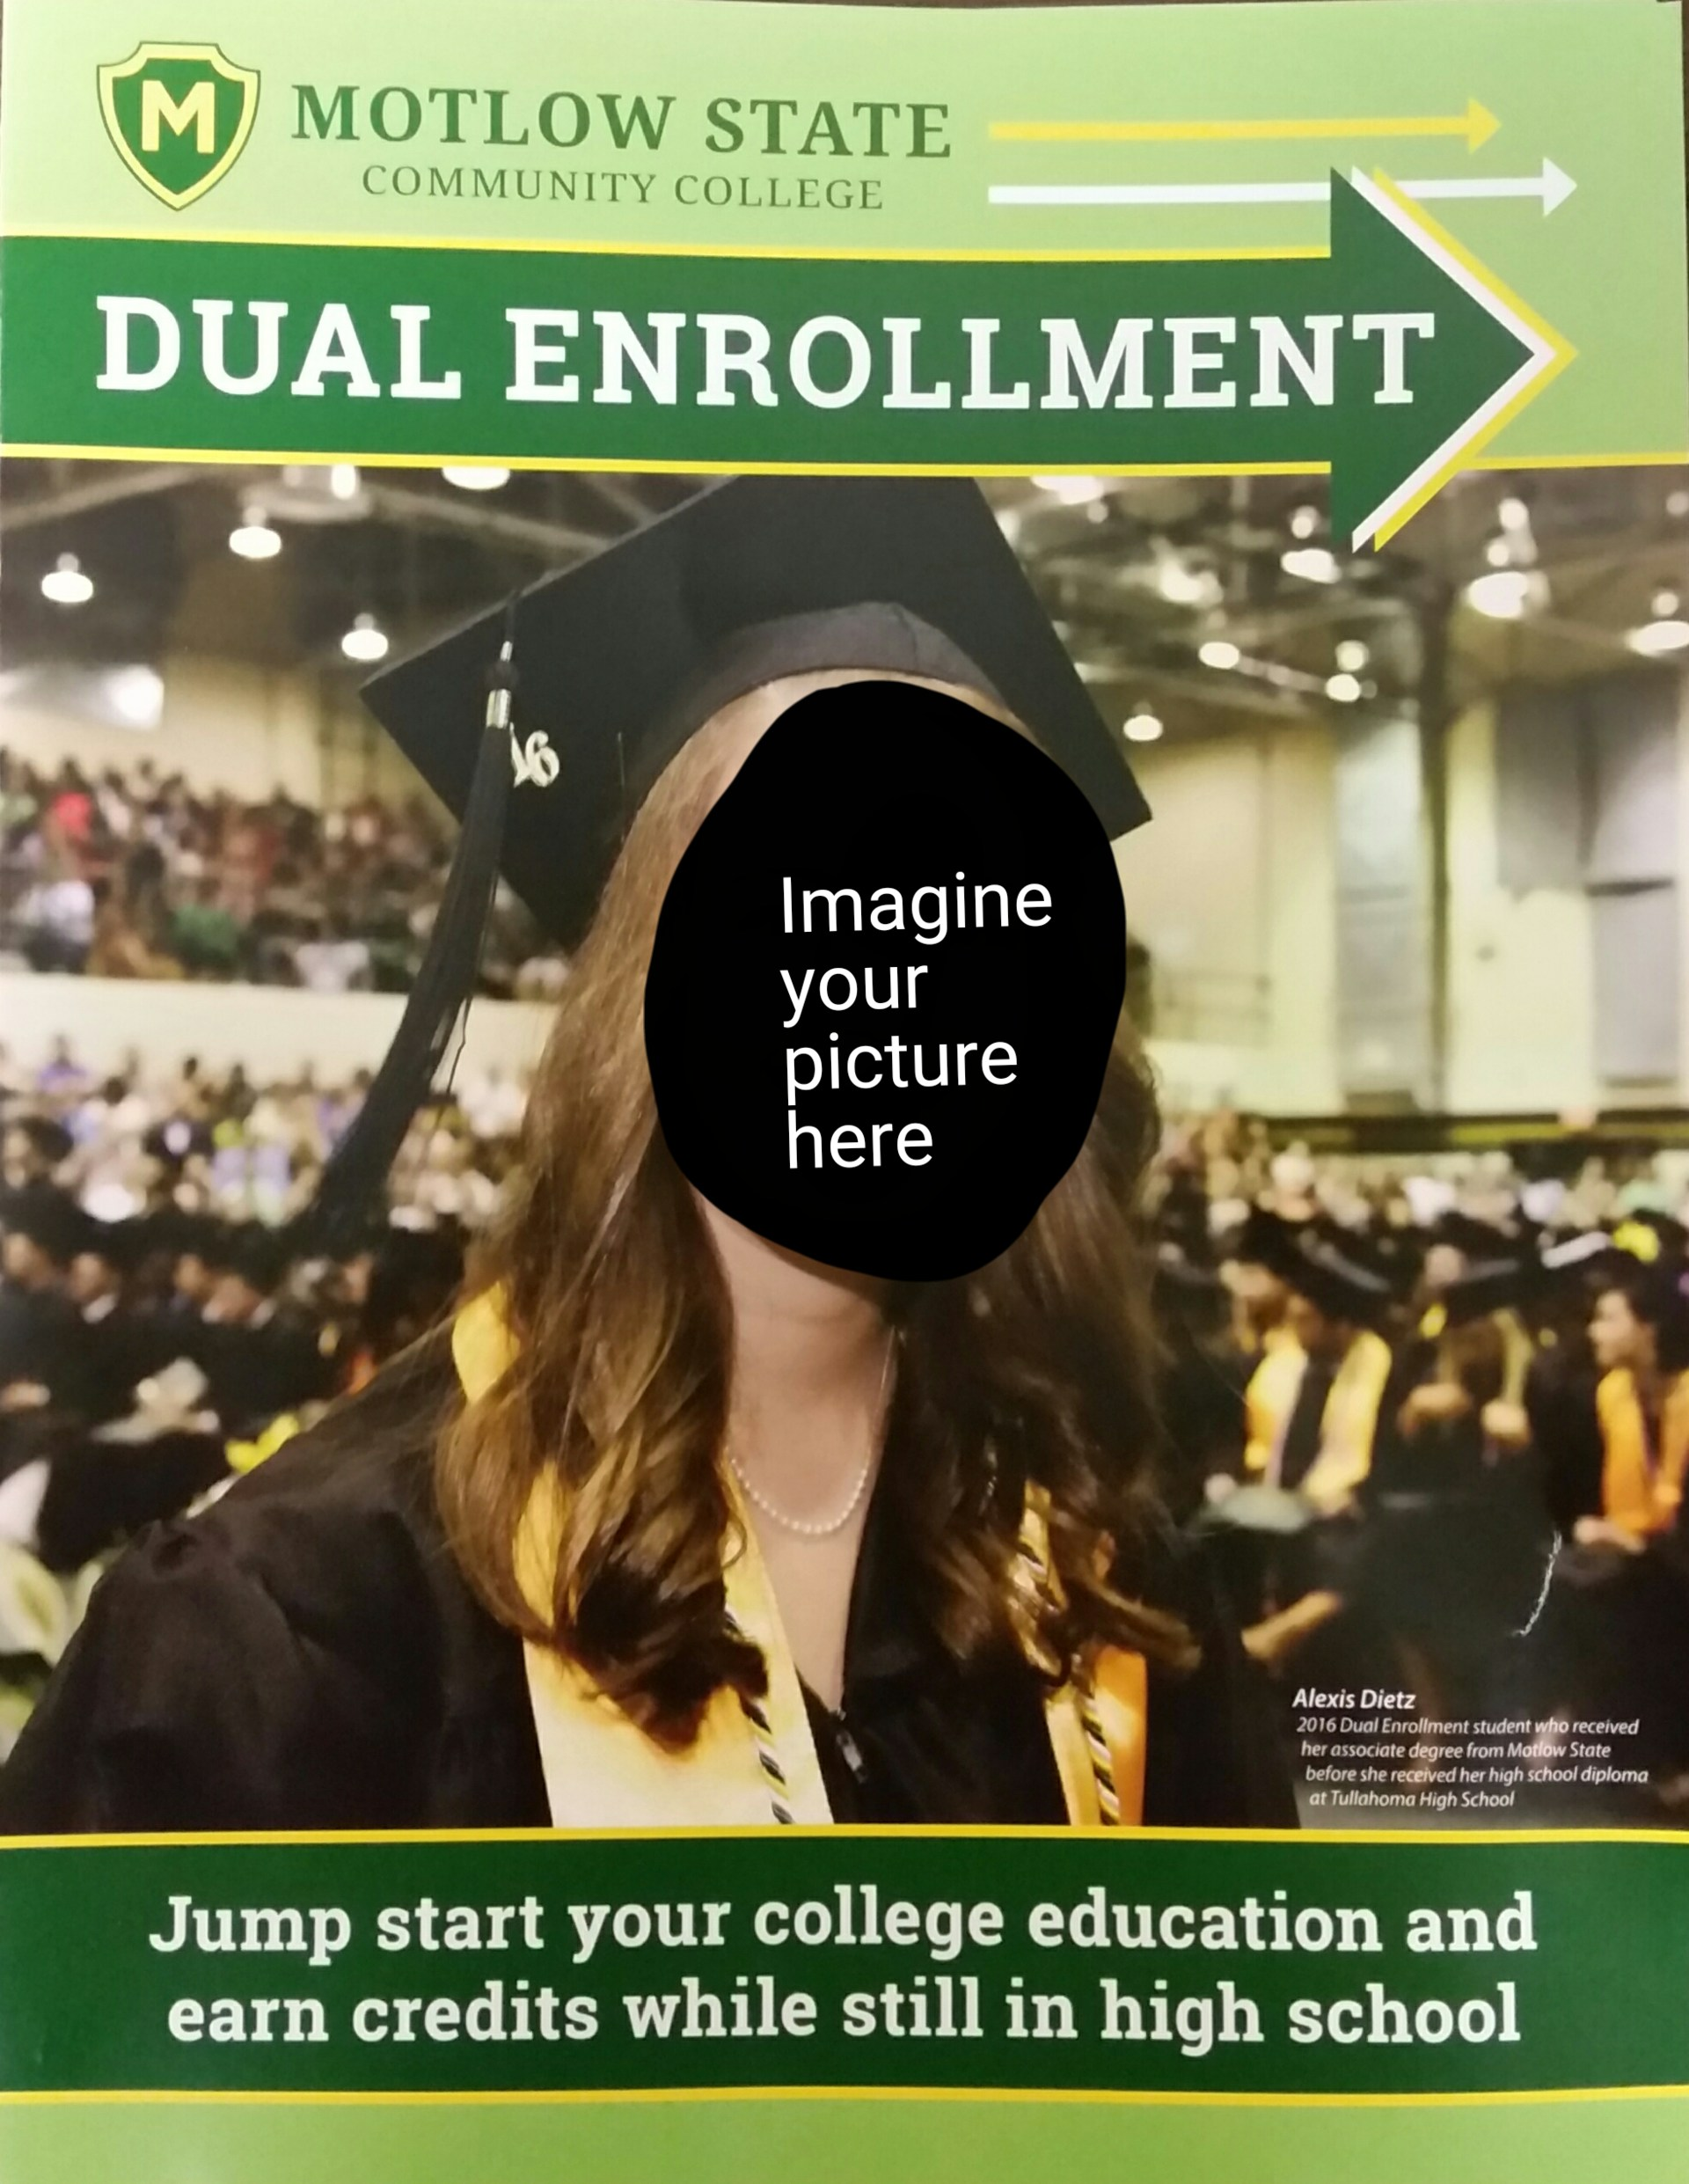 Motlow dual enrollment